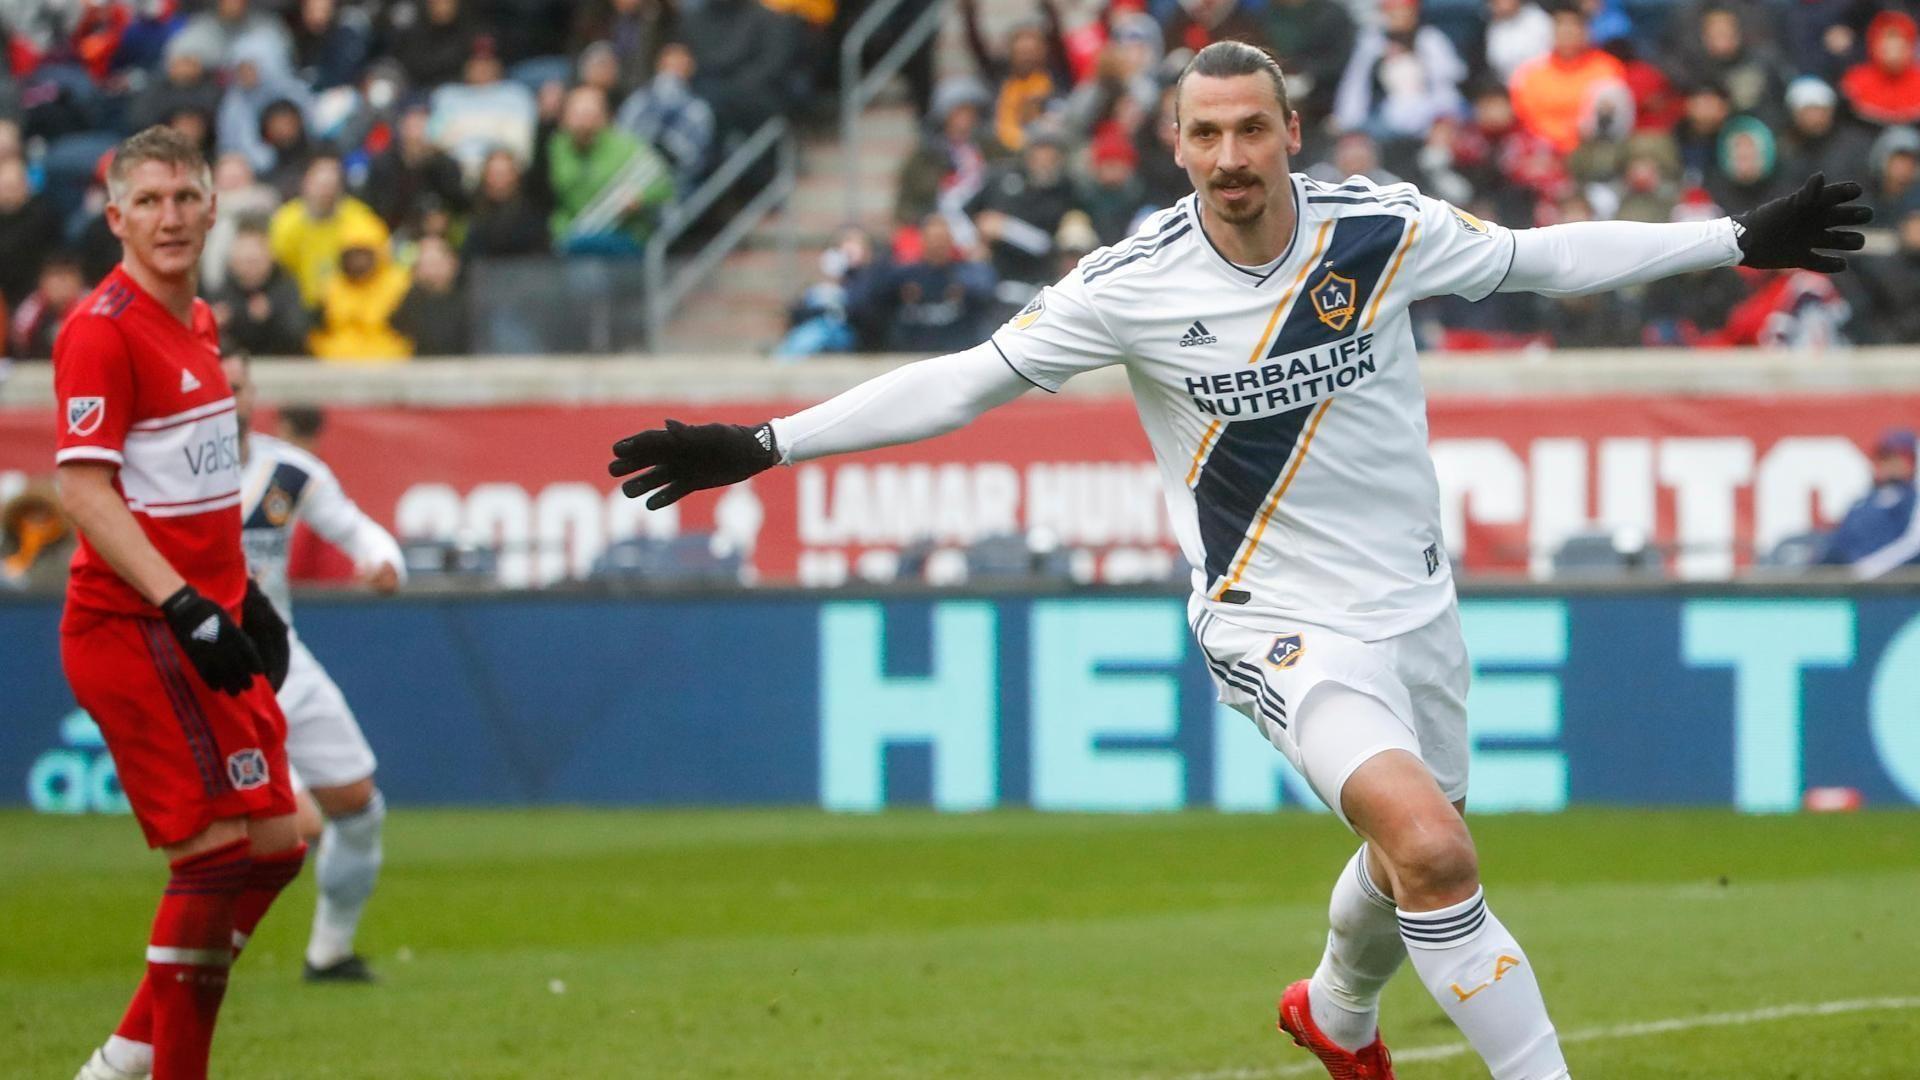 Ibrahimovic scores winner in first LA Galaxy start - Via MLS